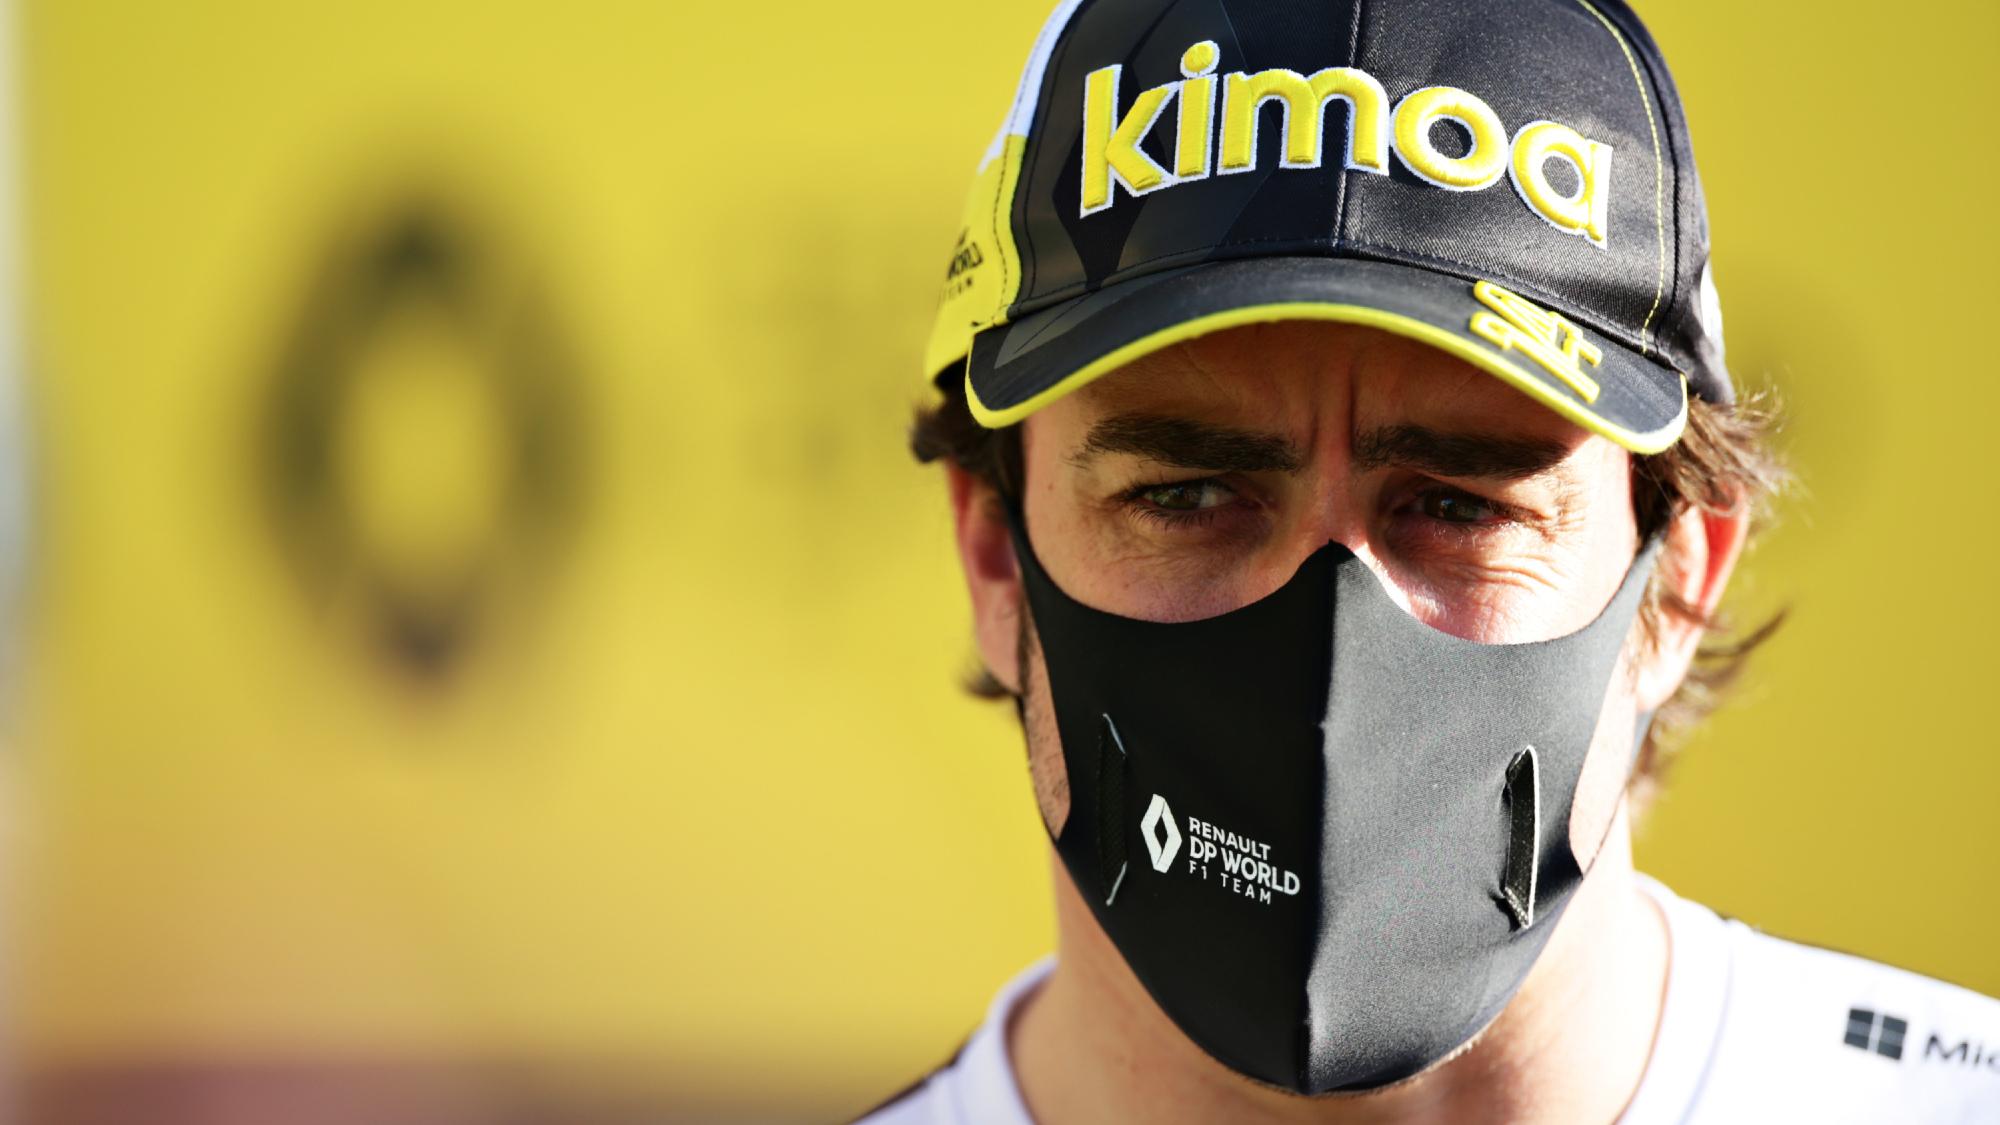 Fernando Alonso, Renault 2020